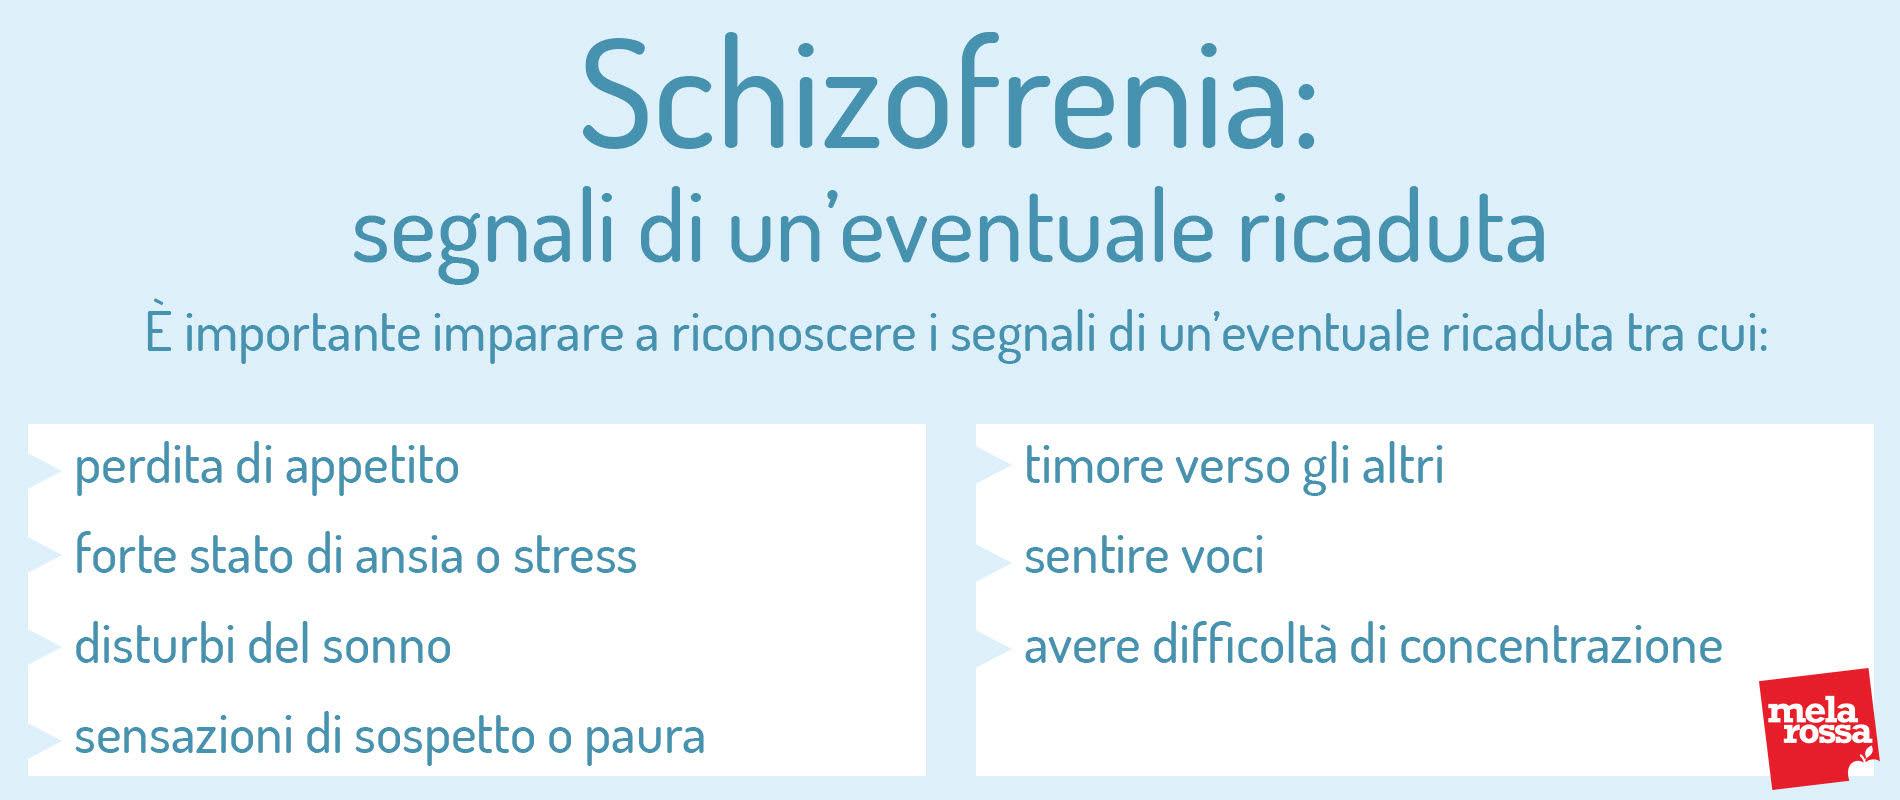 Schizofrenia: segnali ricaduta